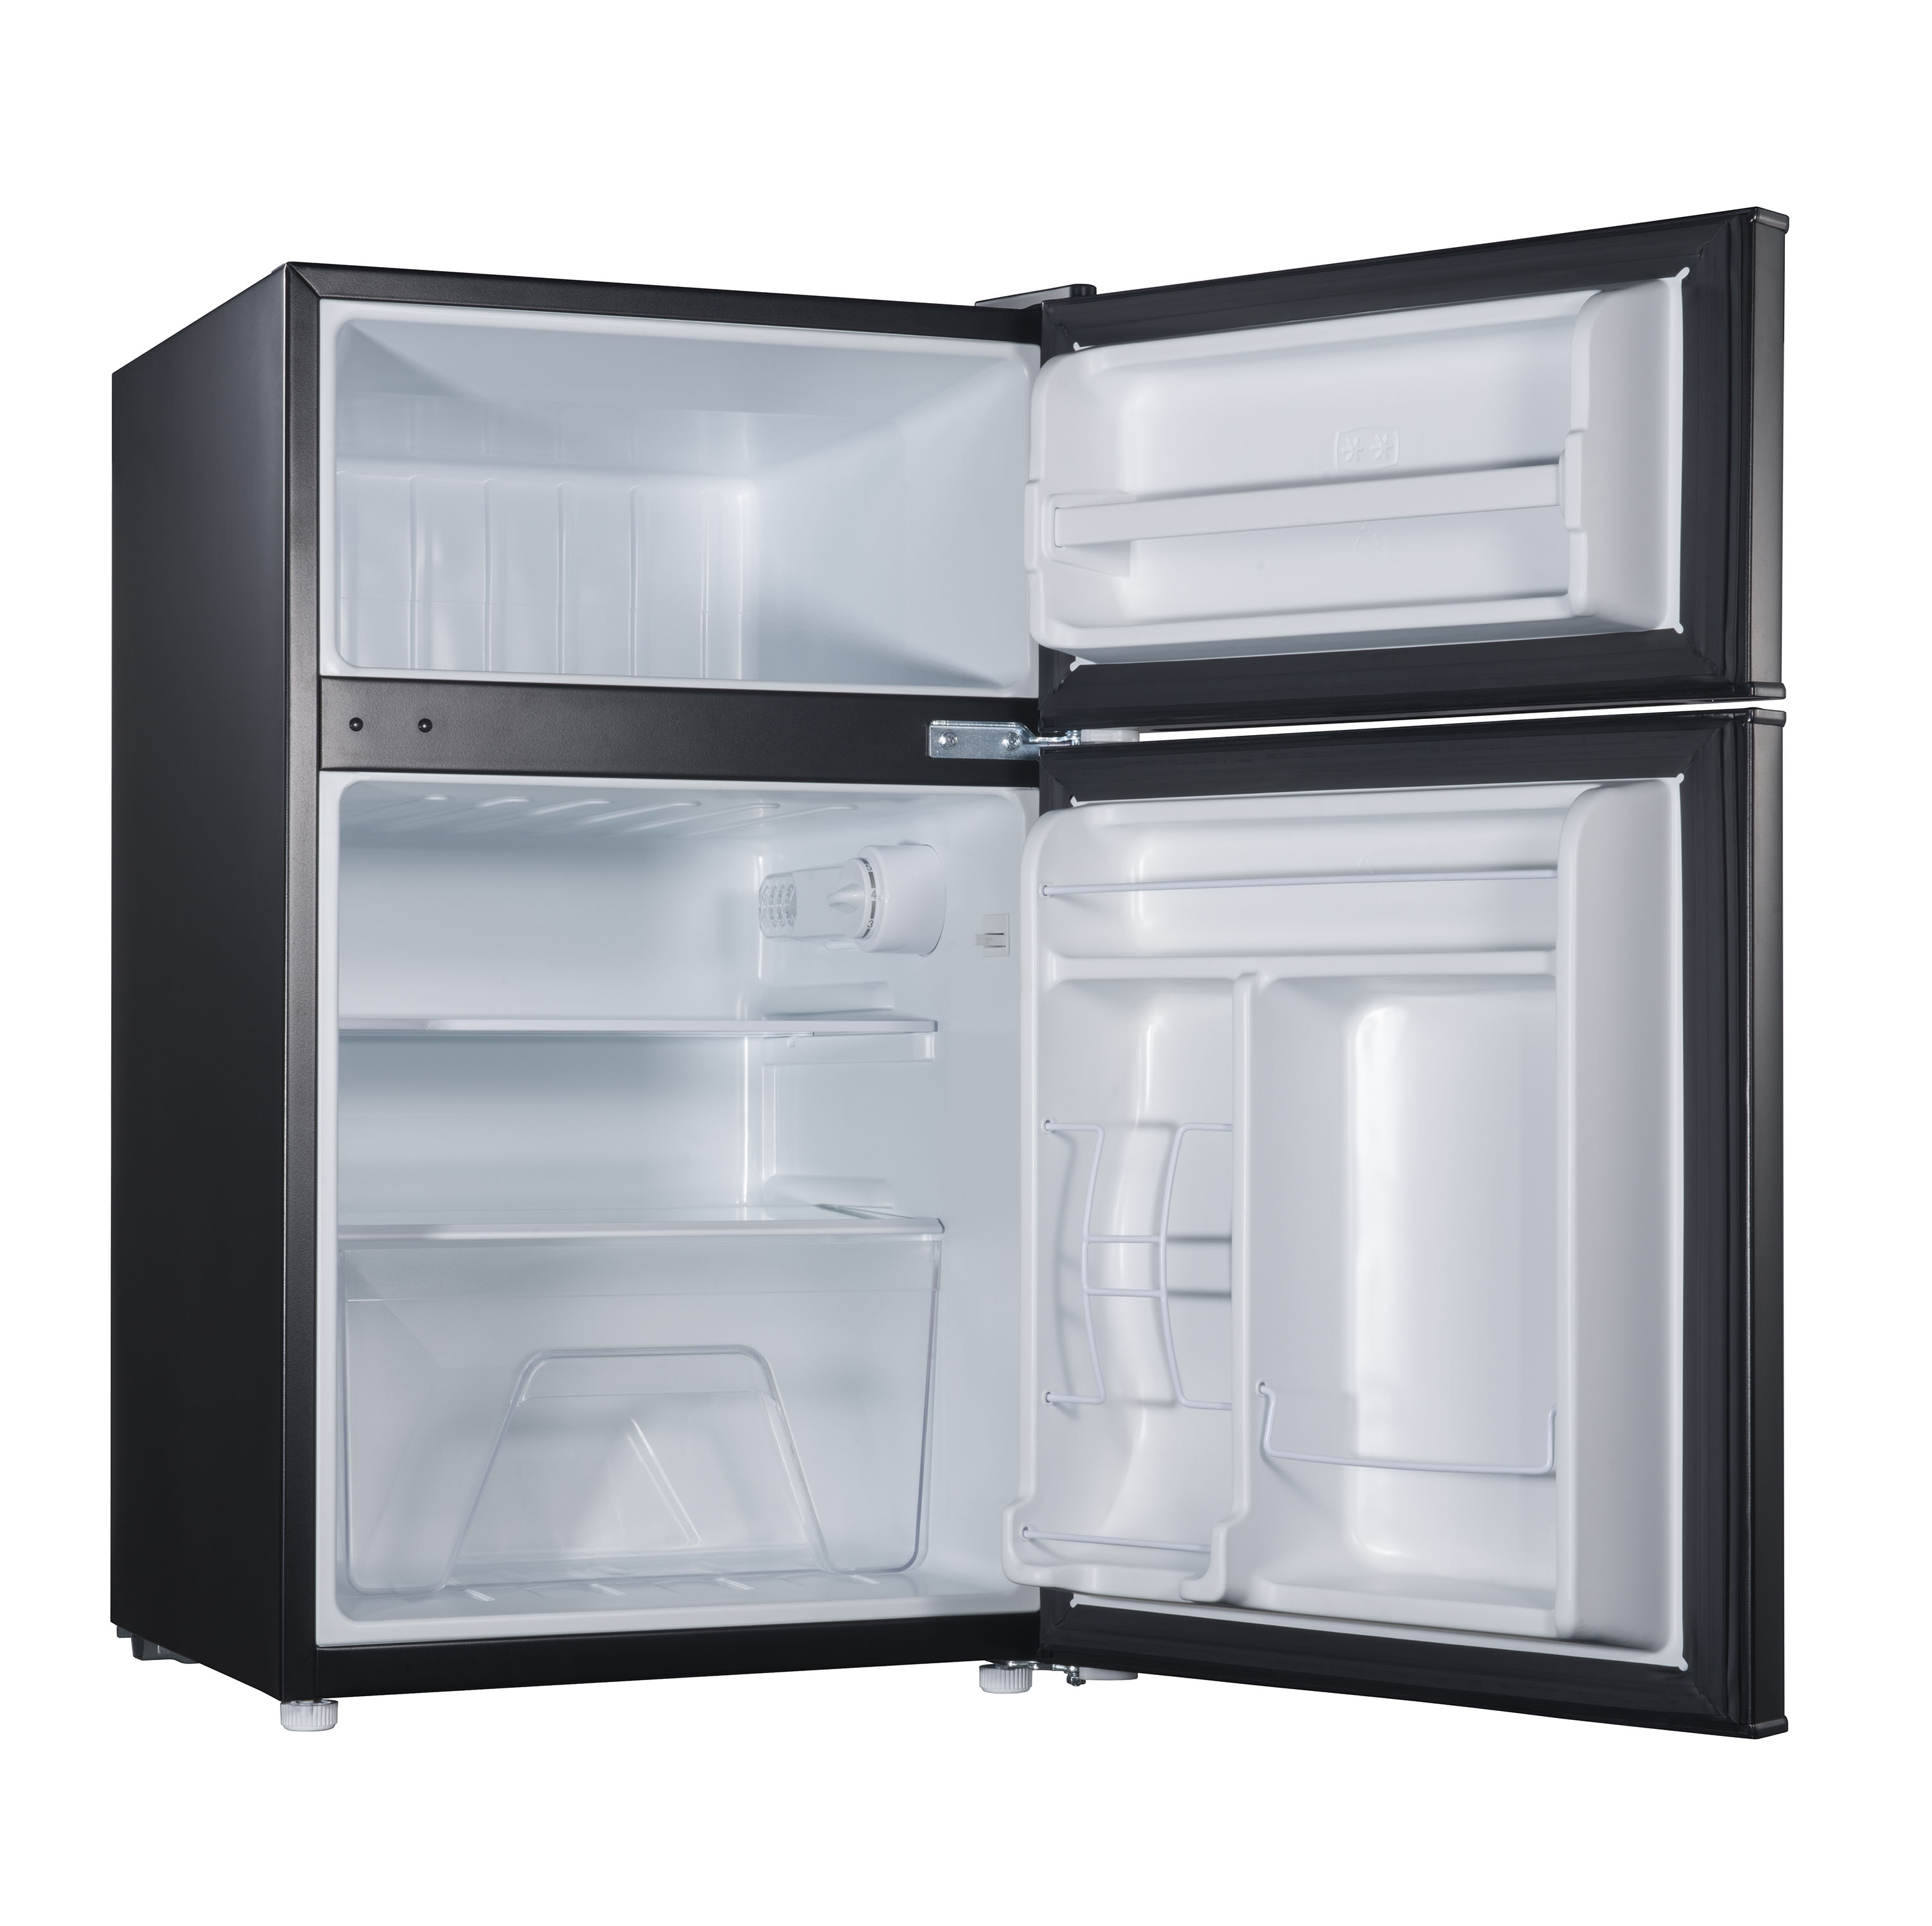 Galanz 3.1 Cu Ft Double Door Compact Refrigerator GL31BK, Black ...